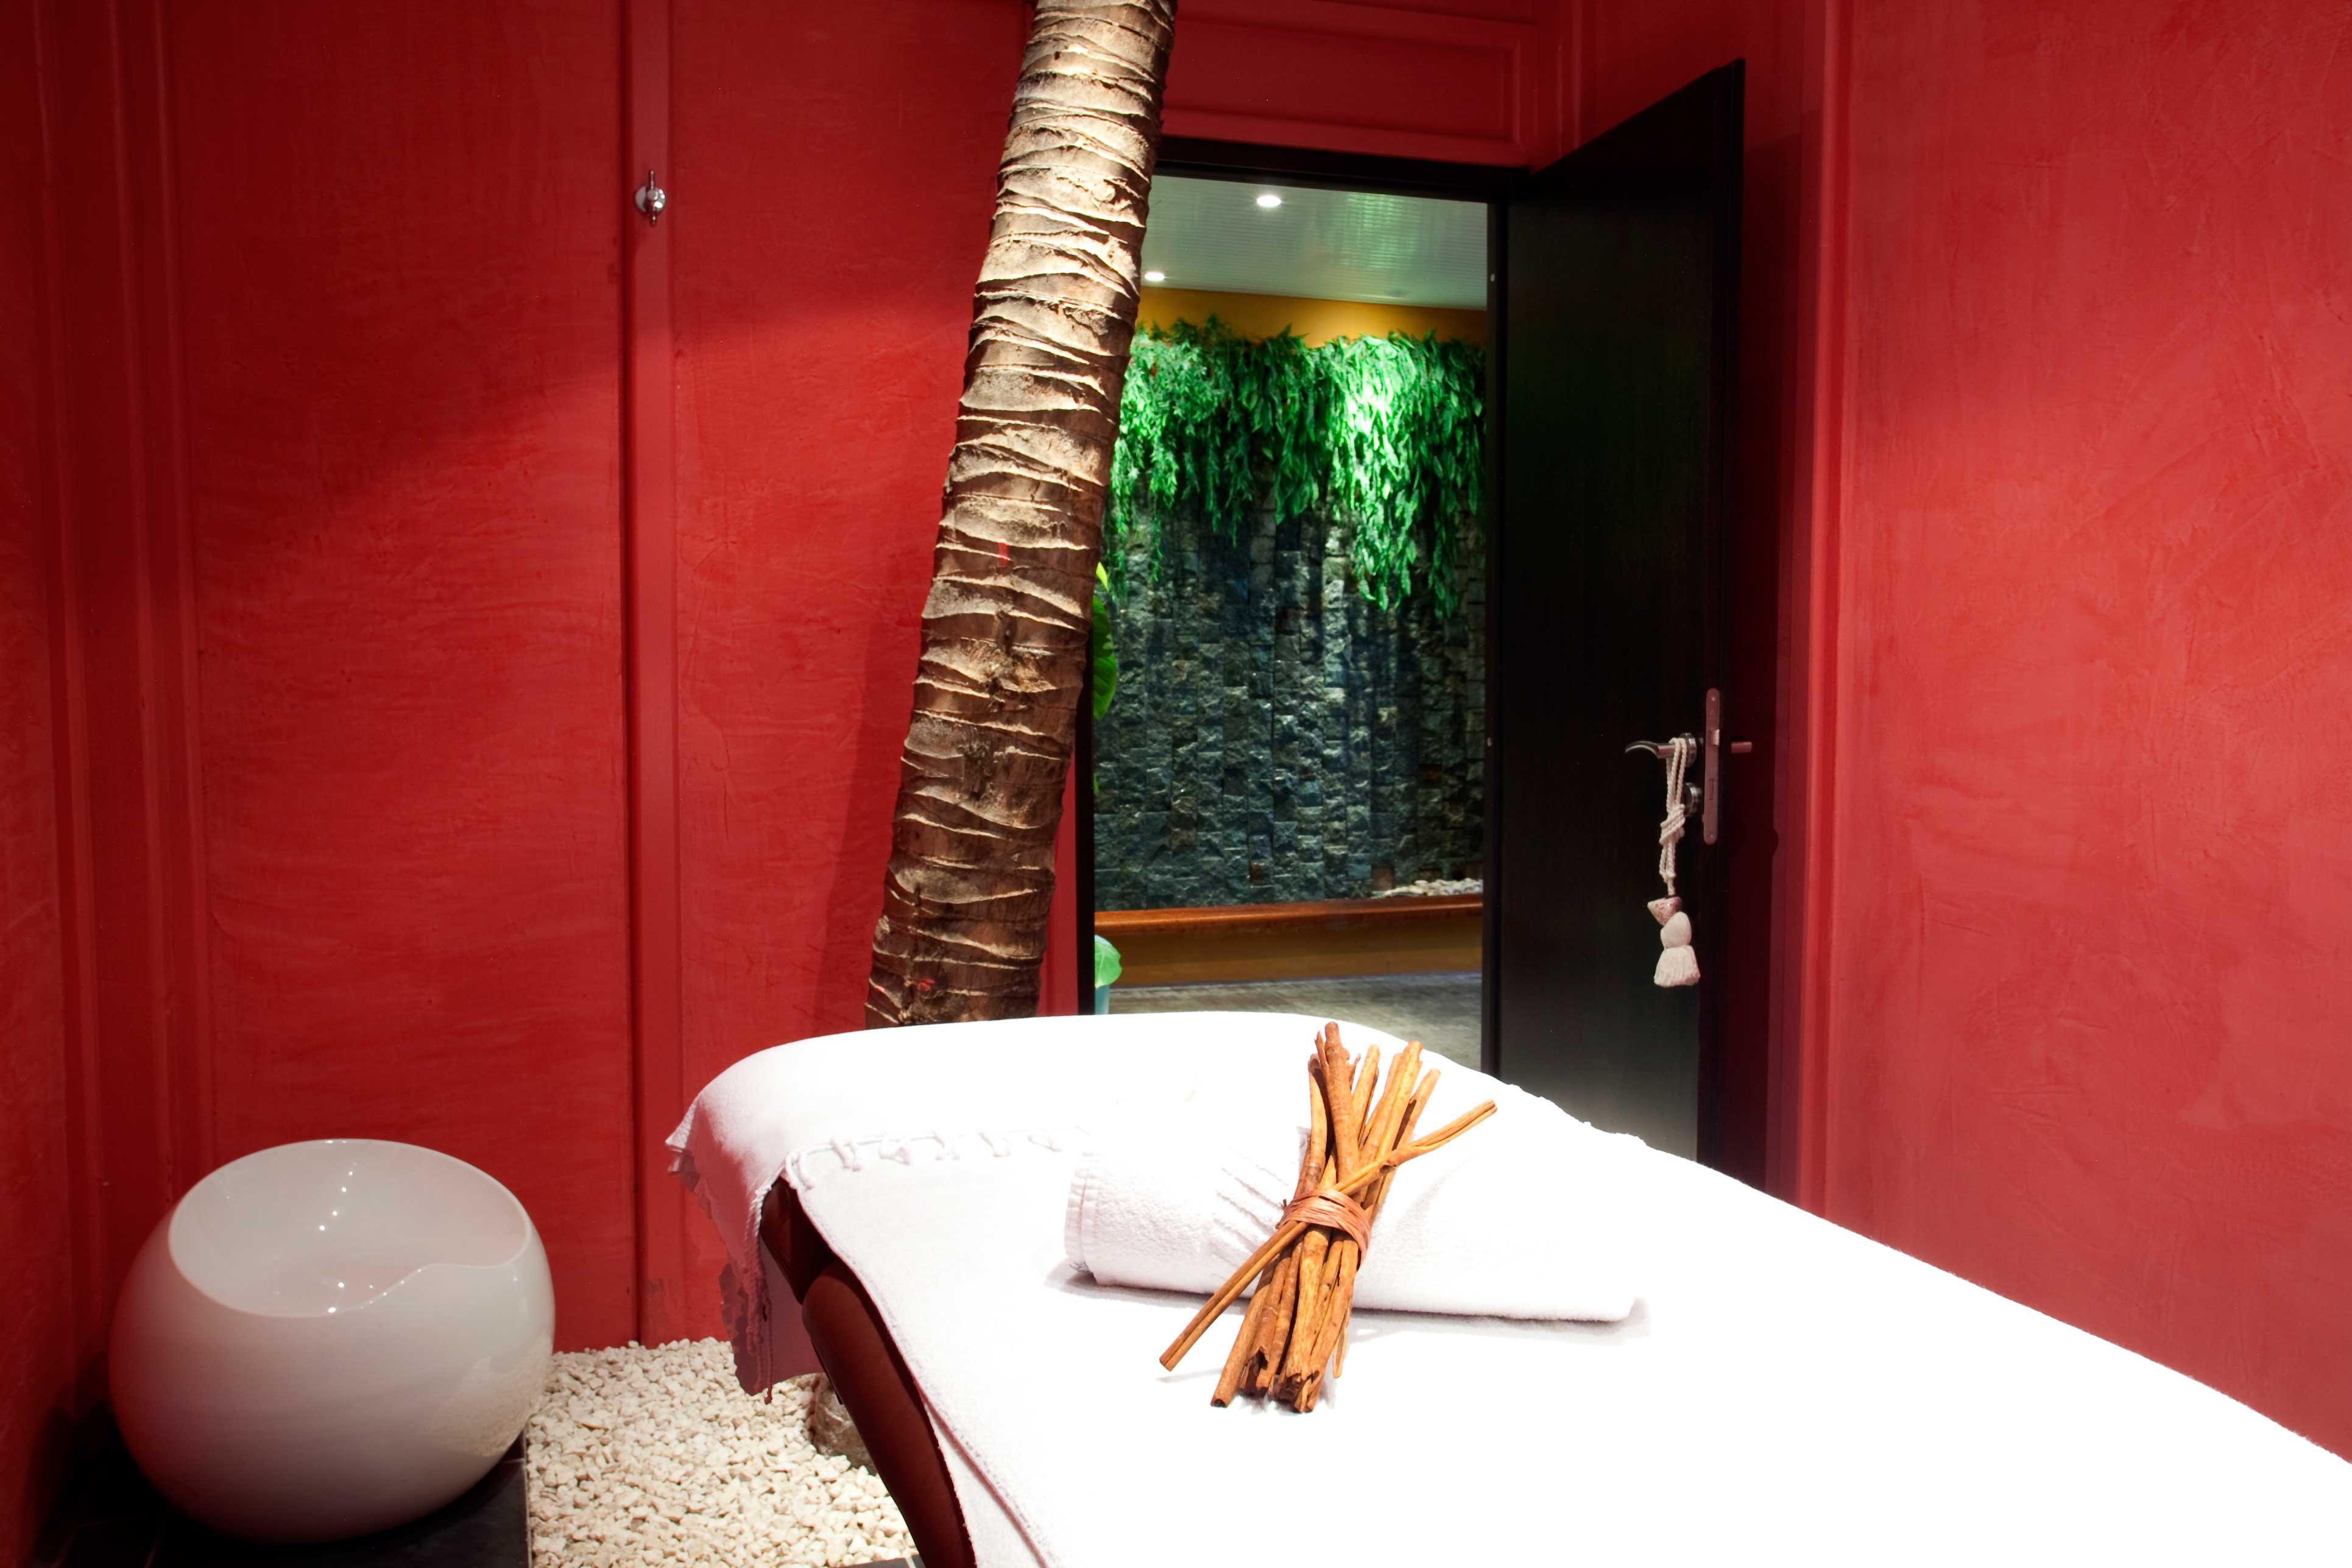 http://www.deshotelsetdesiles.com/hotel-vol-guadeloupe/photos/Toubana-091.jpg